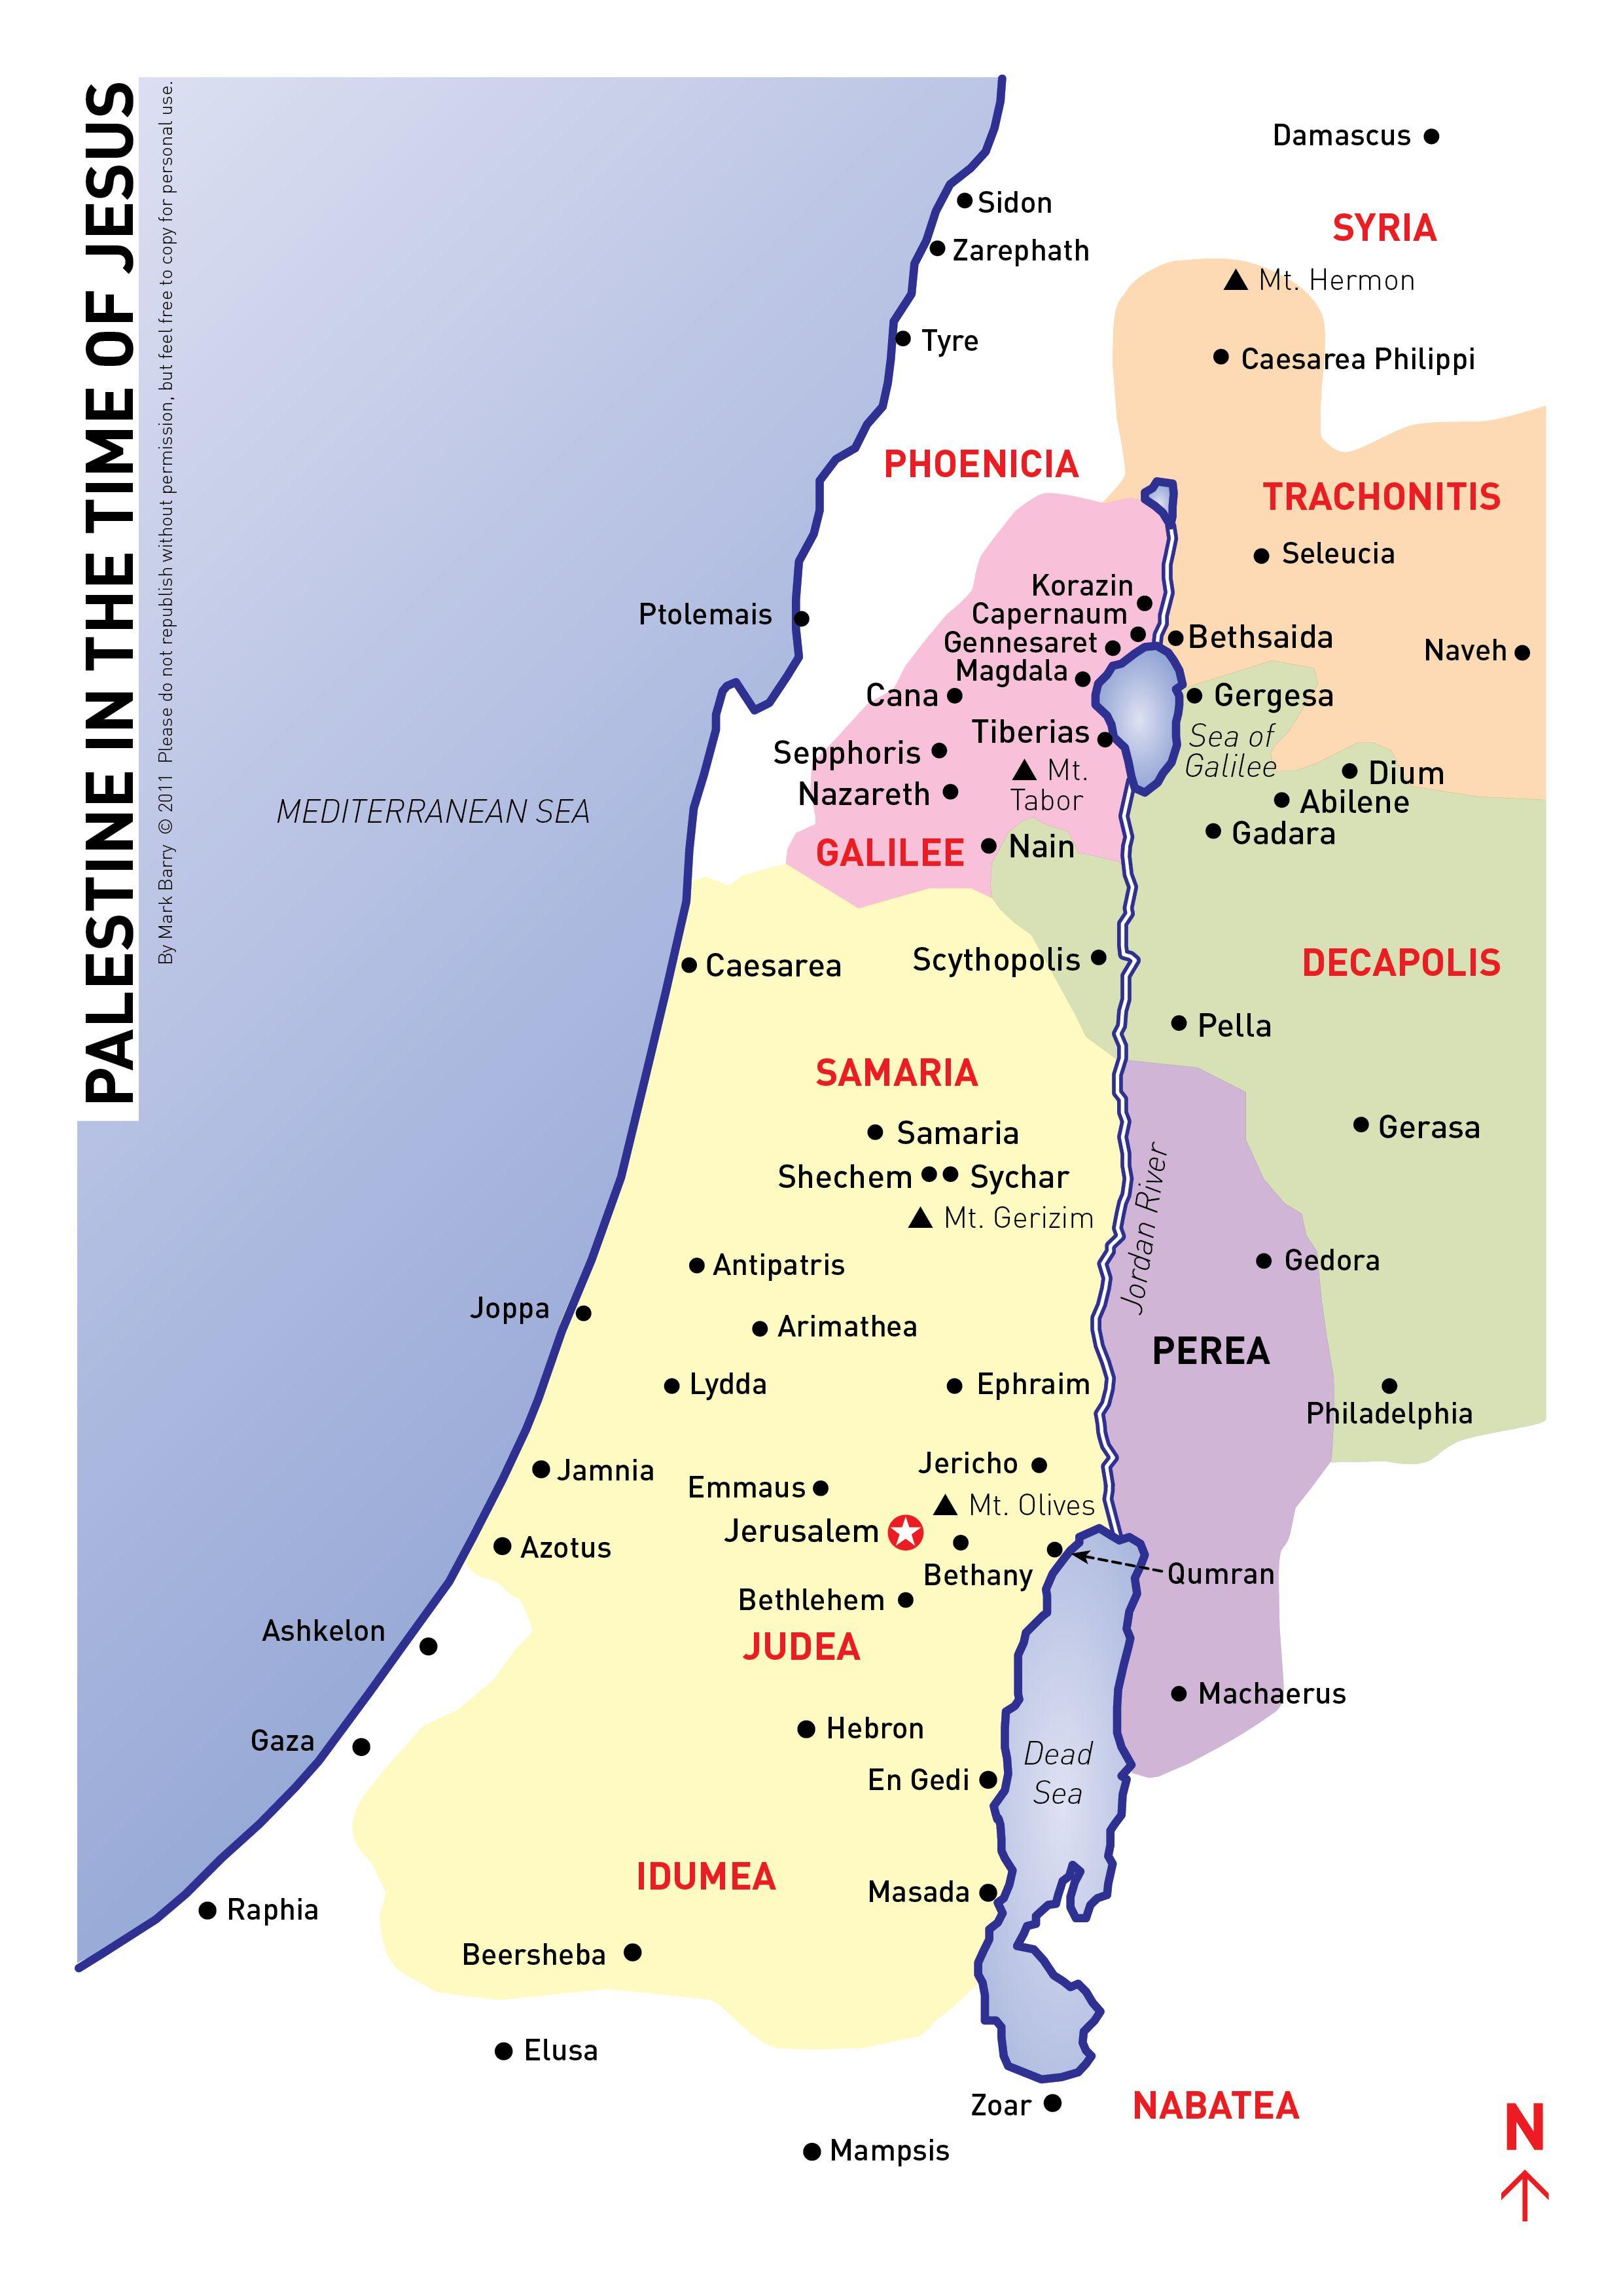 israel palestine border line dispute timeline